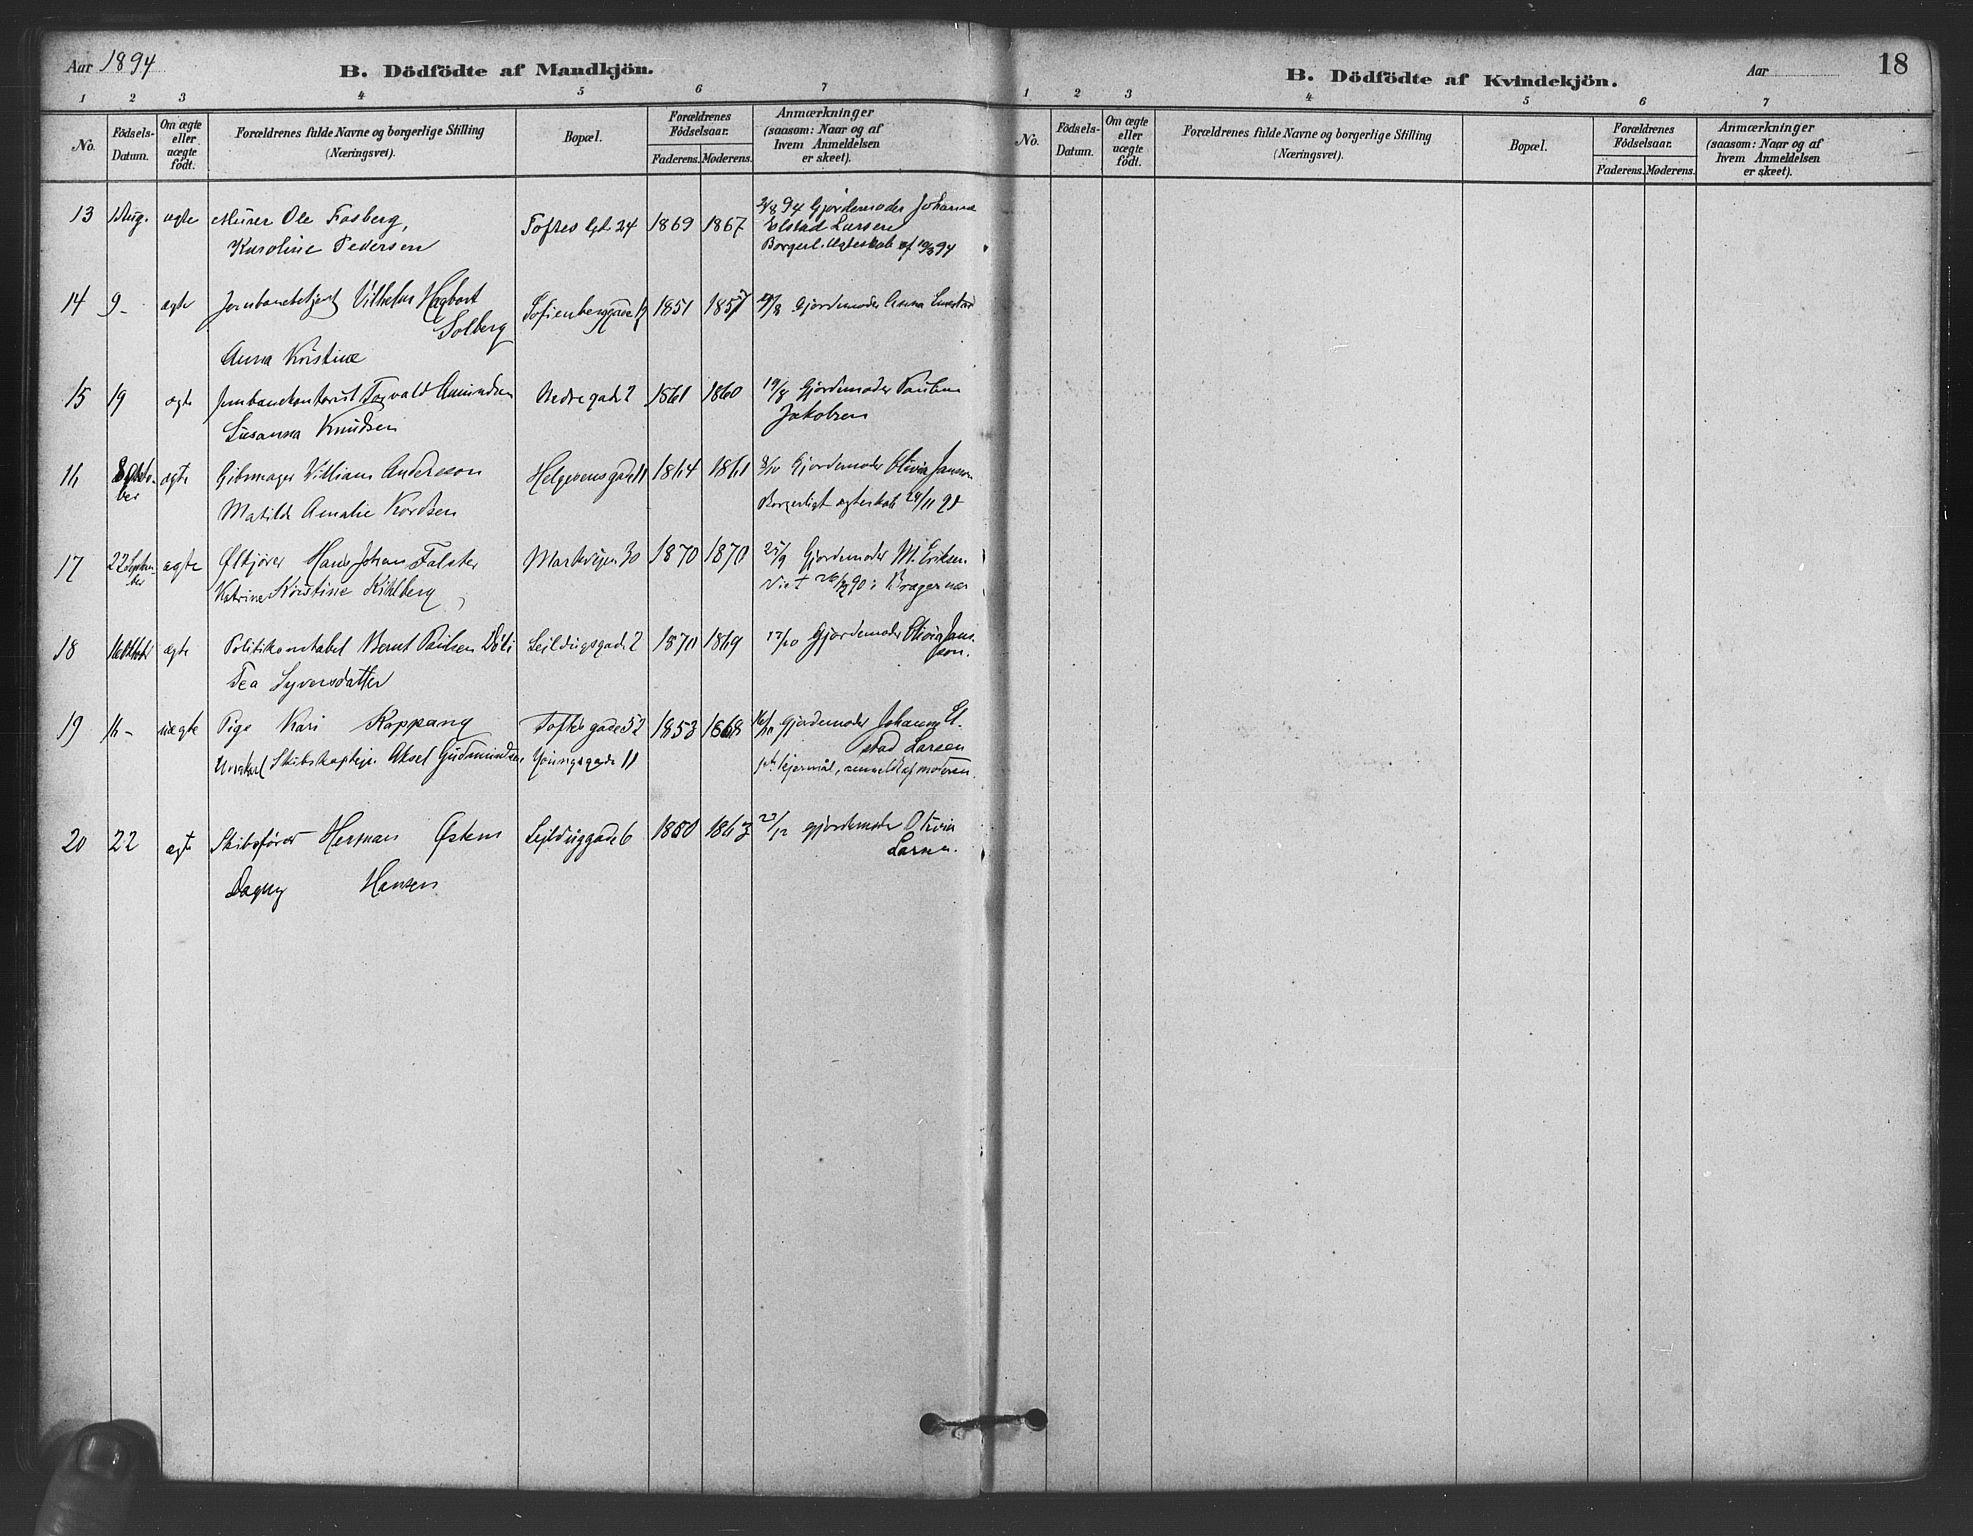 SAO, Paulus prestekontor Kirkebøker, F/Fa/L0005: Ministerialbok nr. 5, 1879-1889, s. 18